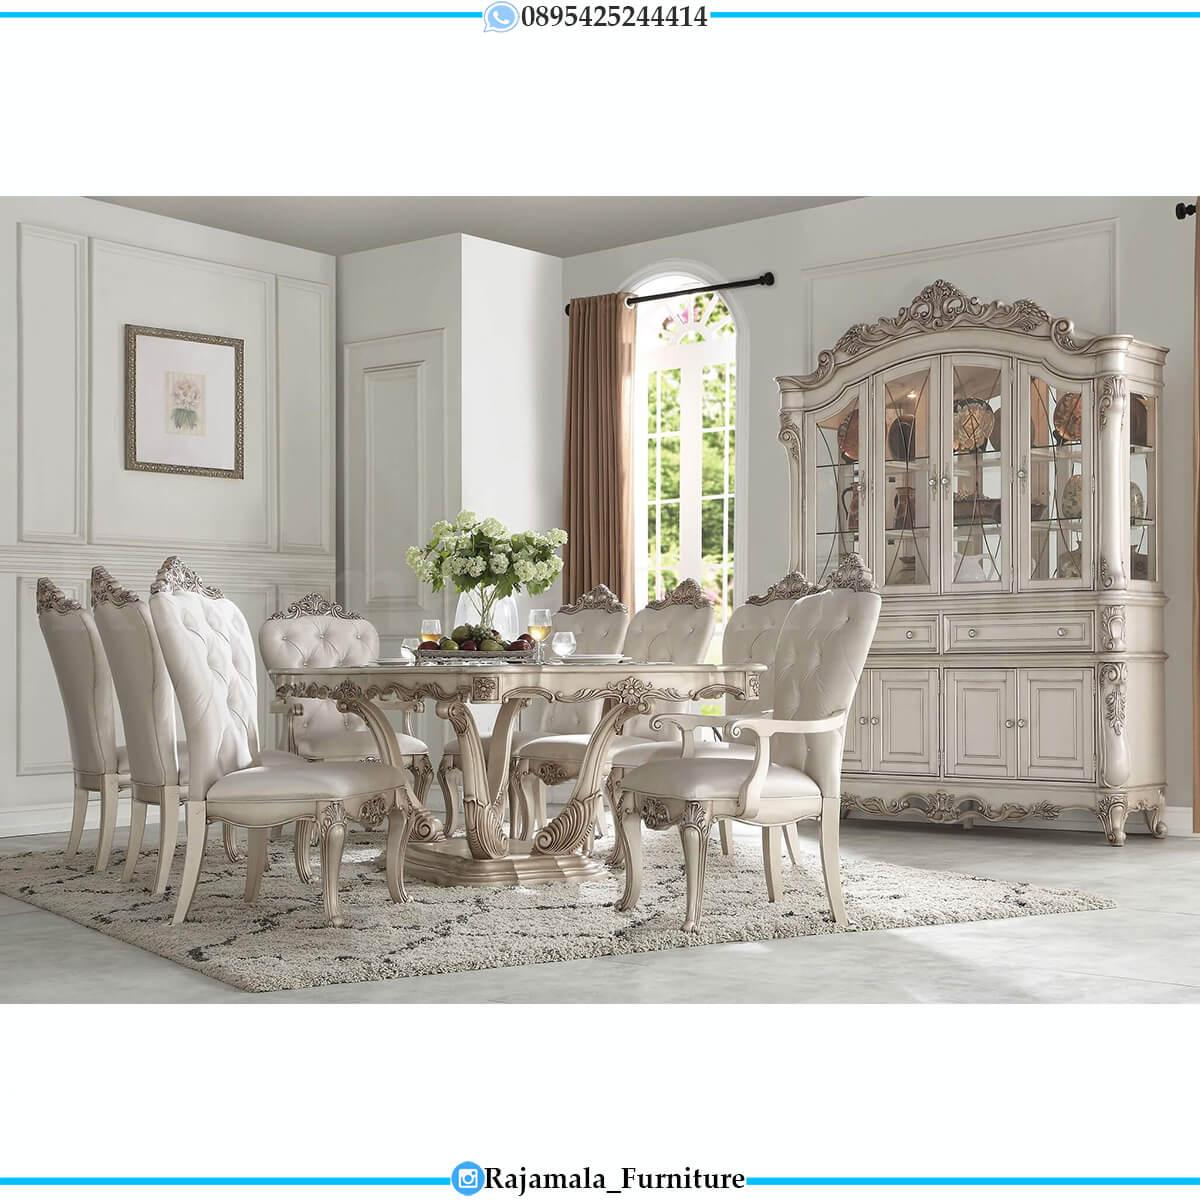 Meja Makan Mewah Jepara Furniture Luxury Classic New Released RM-0714